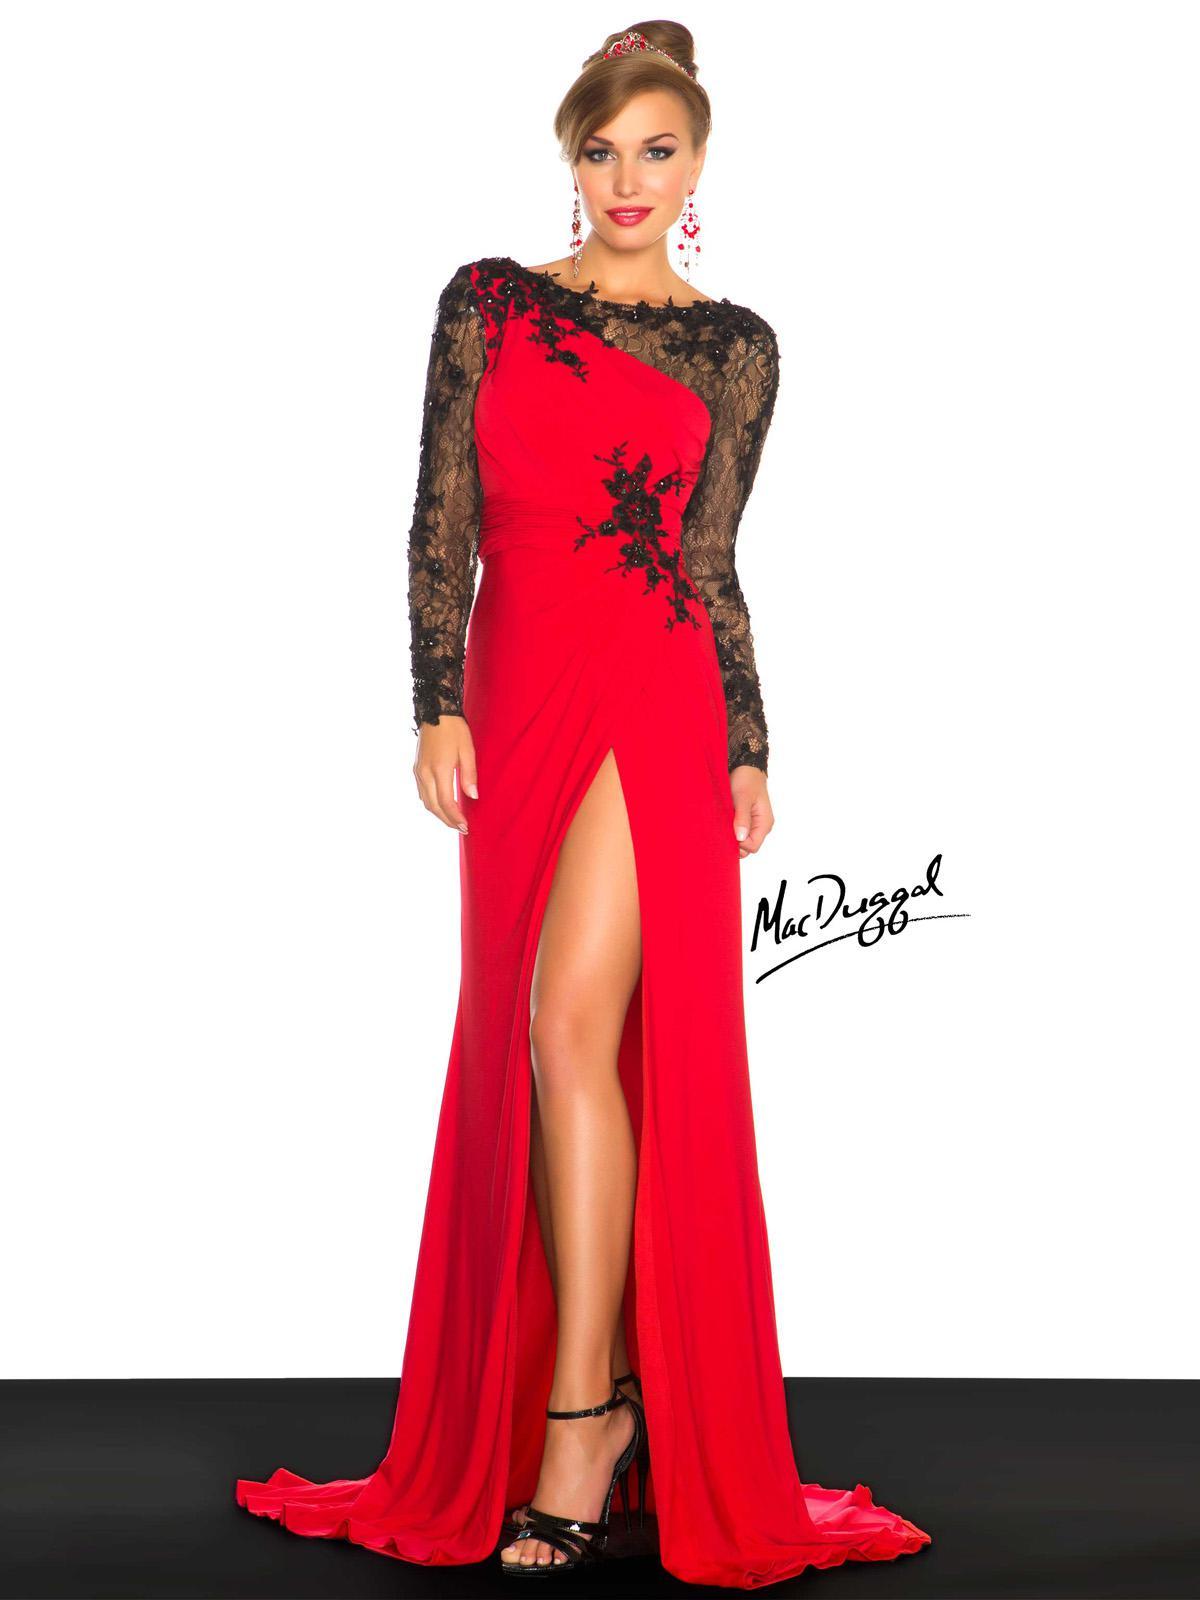 Fall Formal Dresses